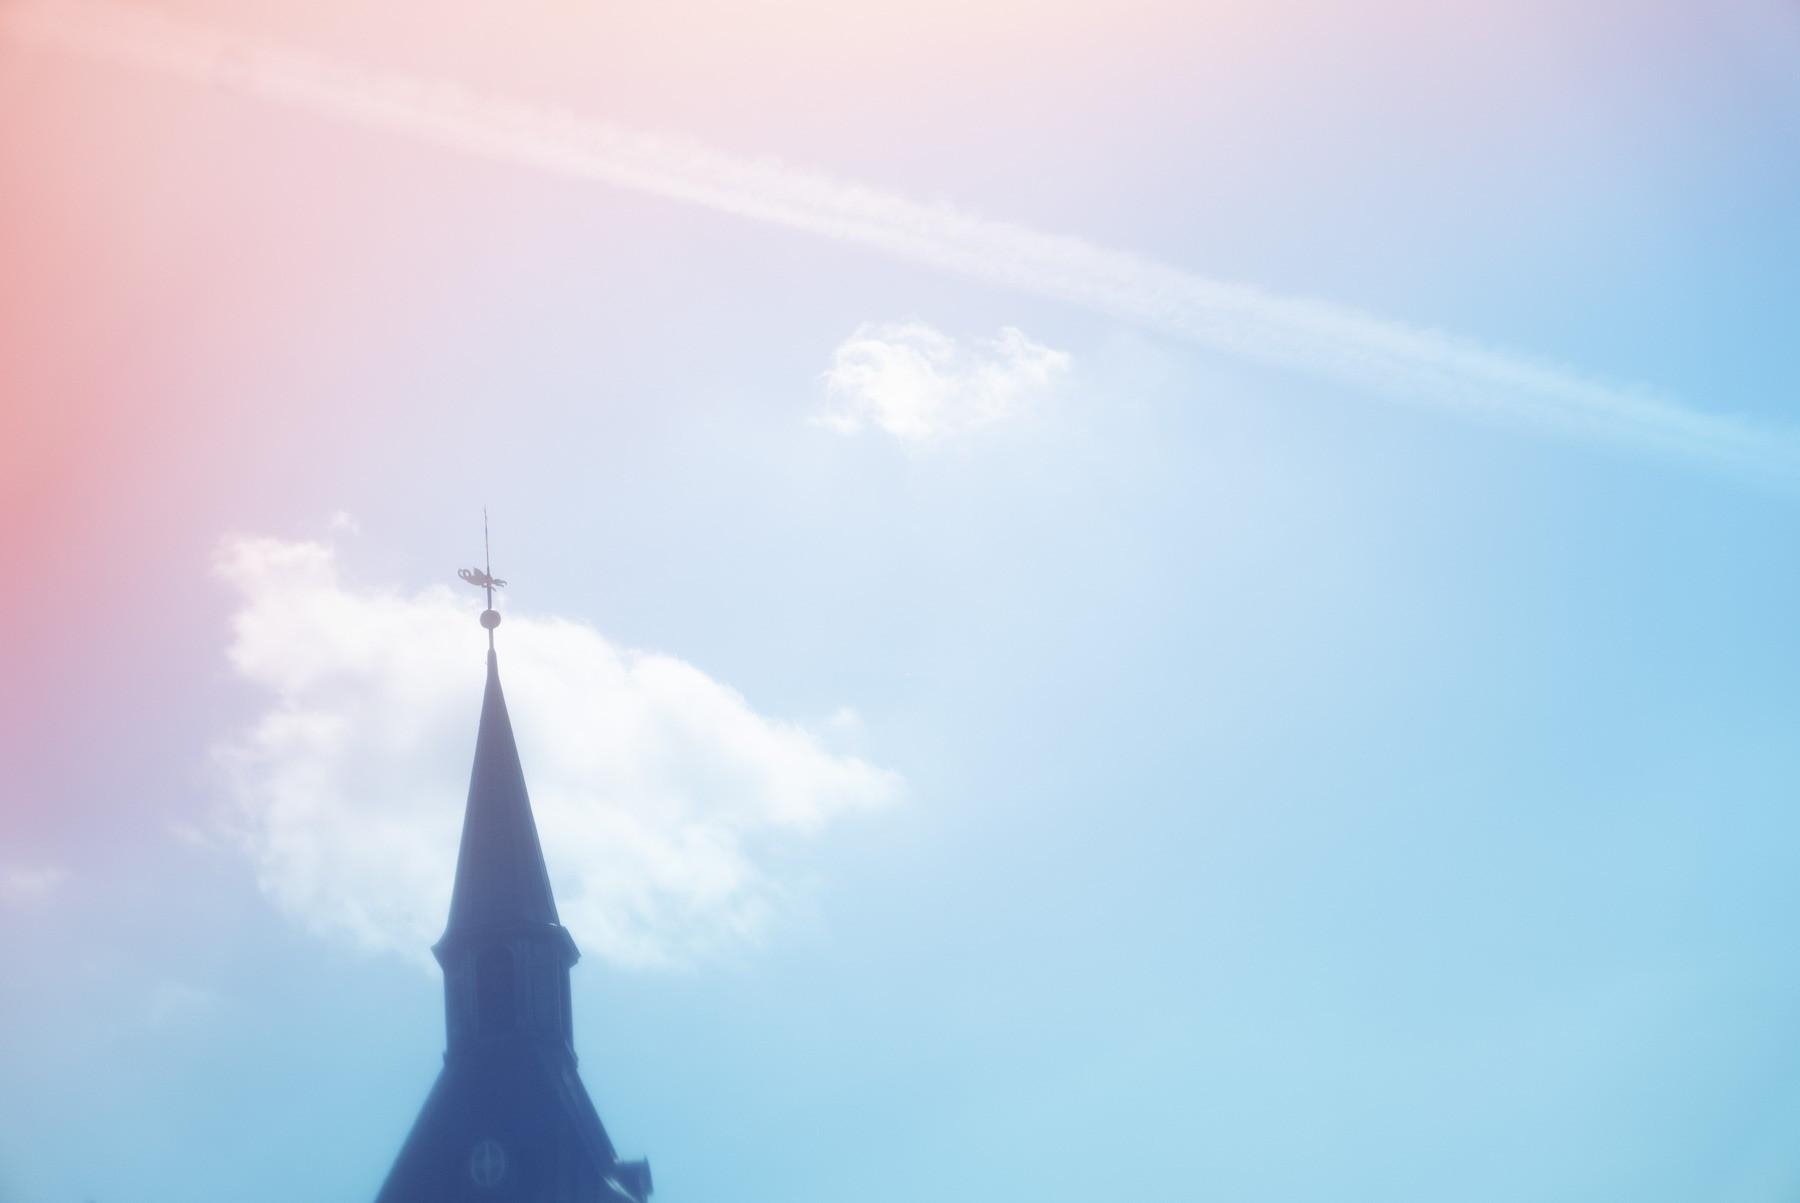 Fotosjov: Farvelader på filtret - farvet himmel